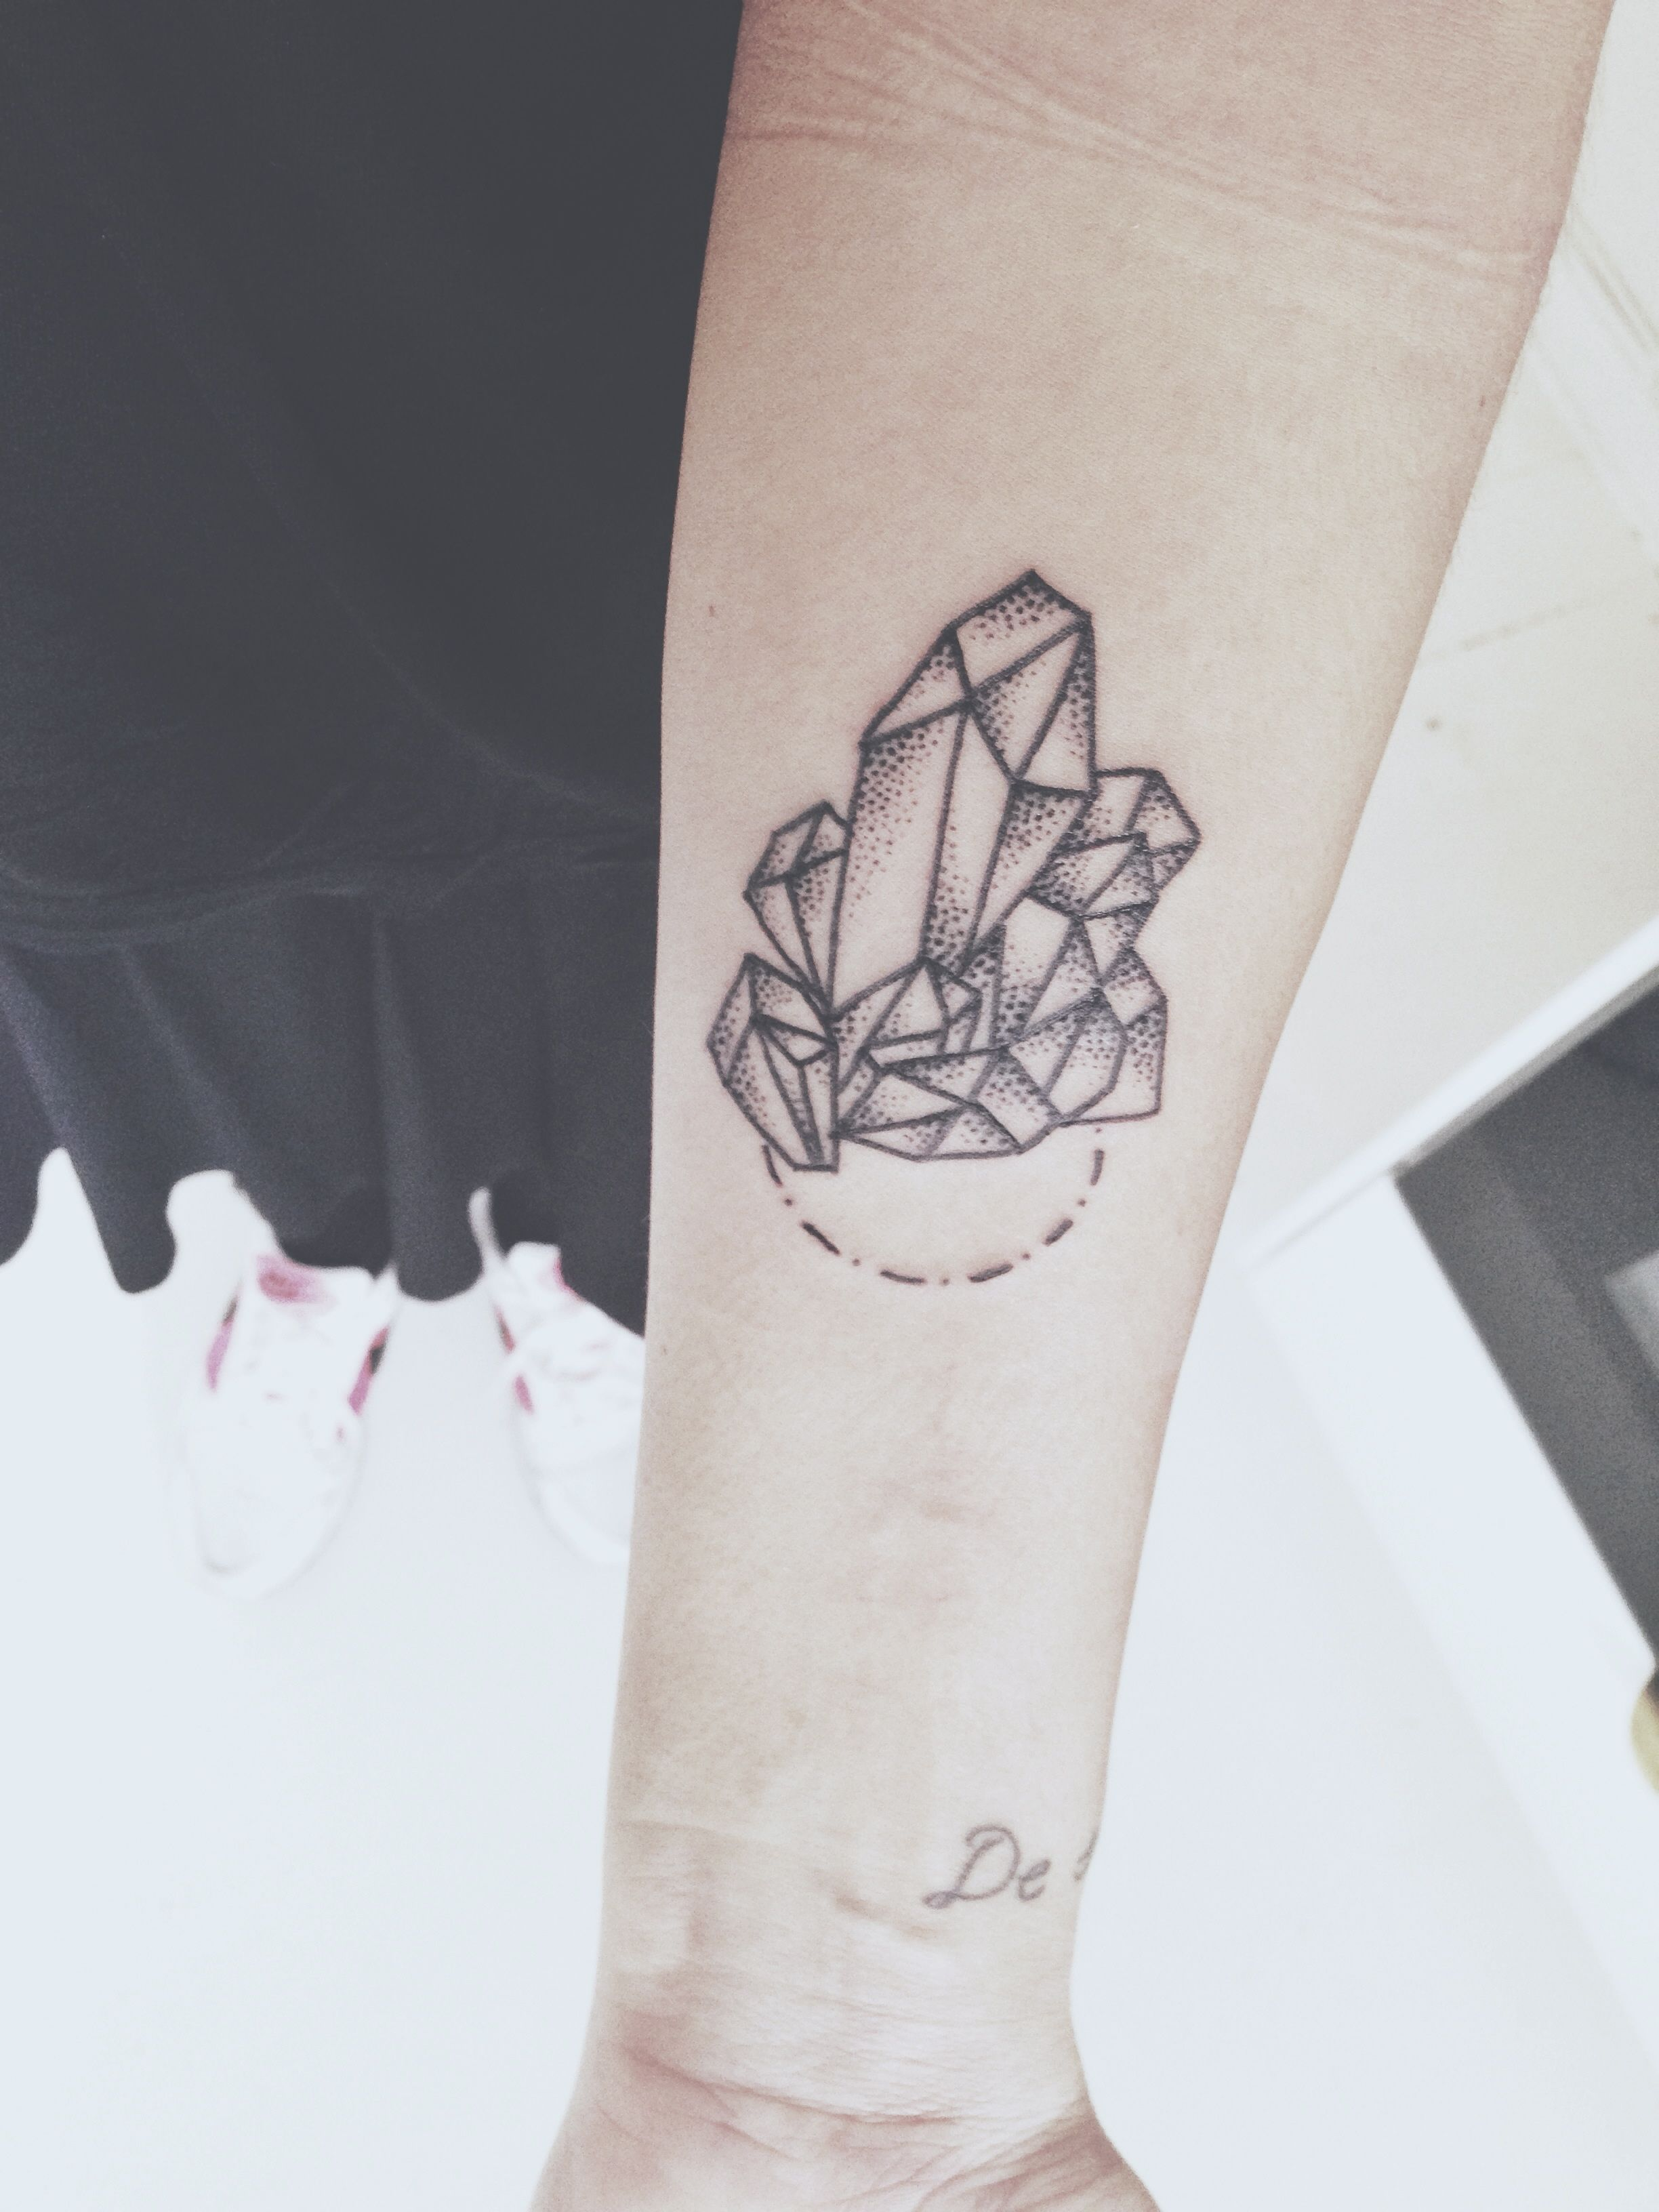 Crystal Tattoo By Ava @ People's Art Tattoo, Copenhagen